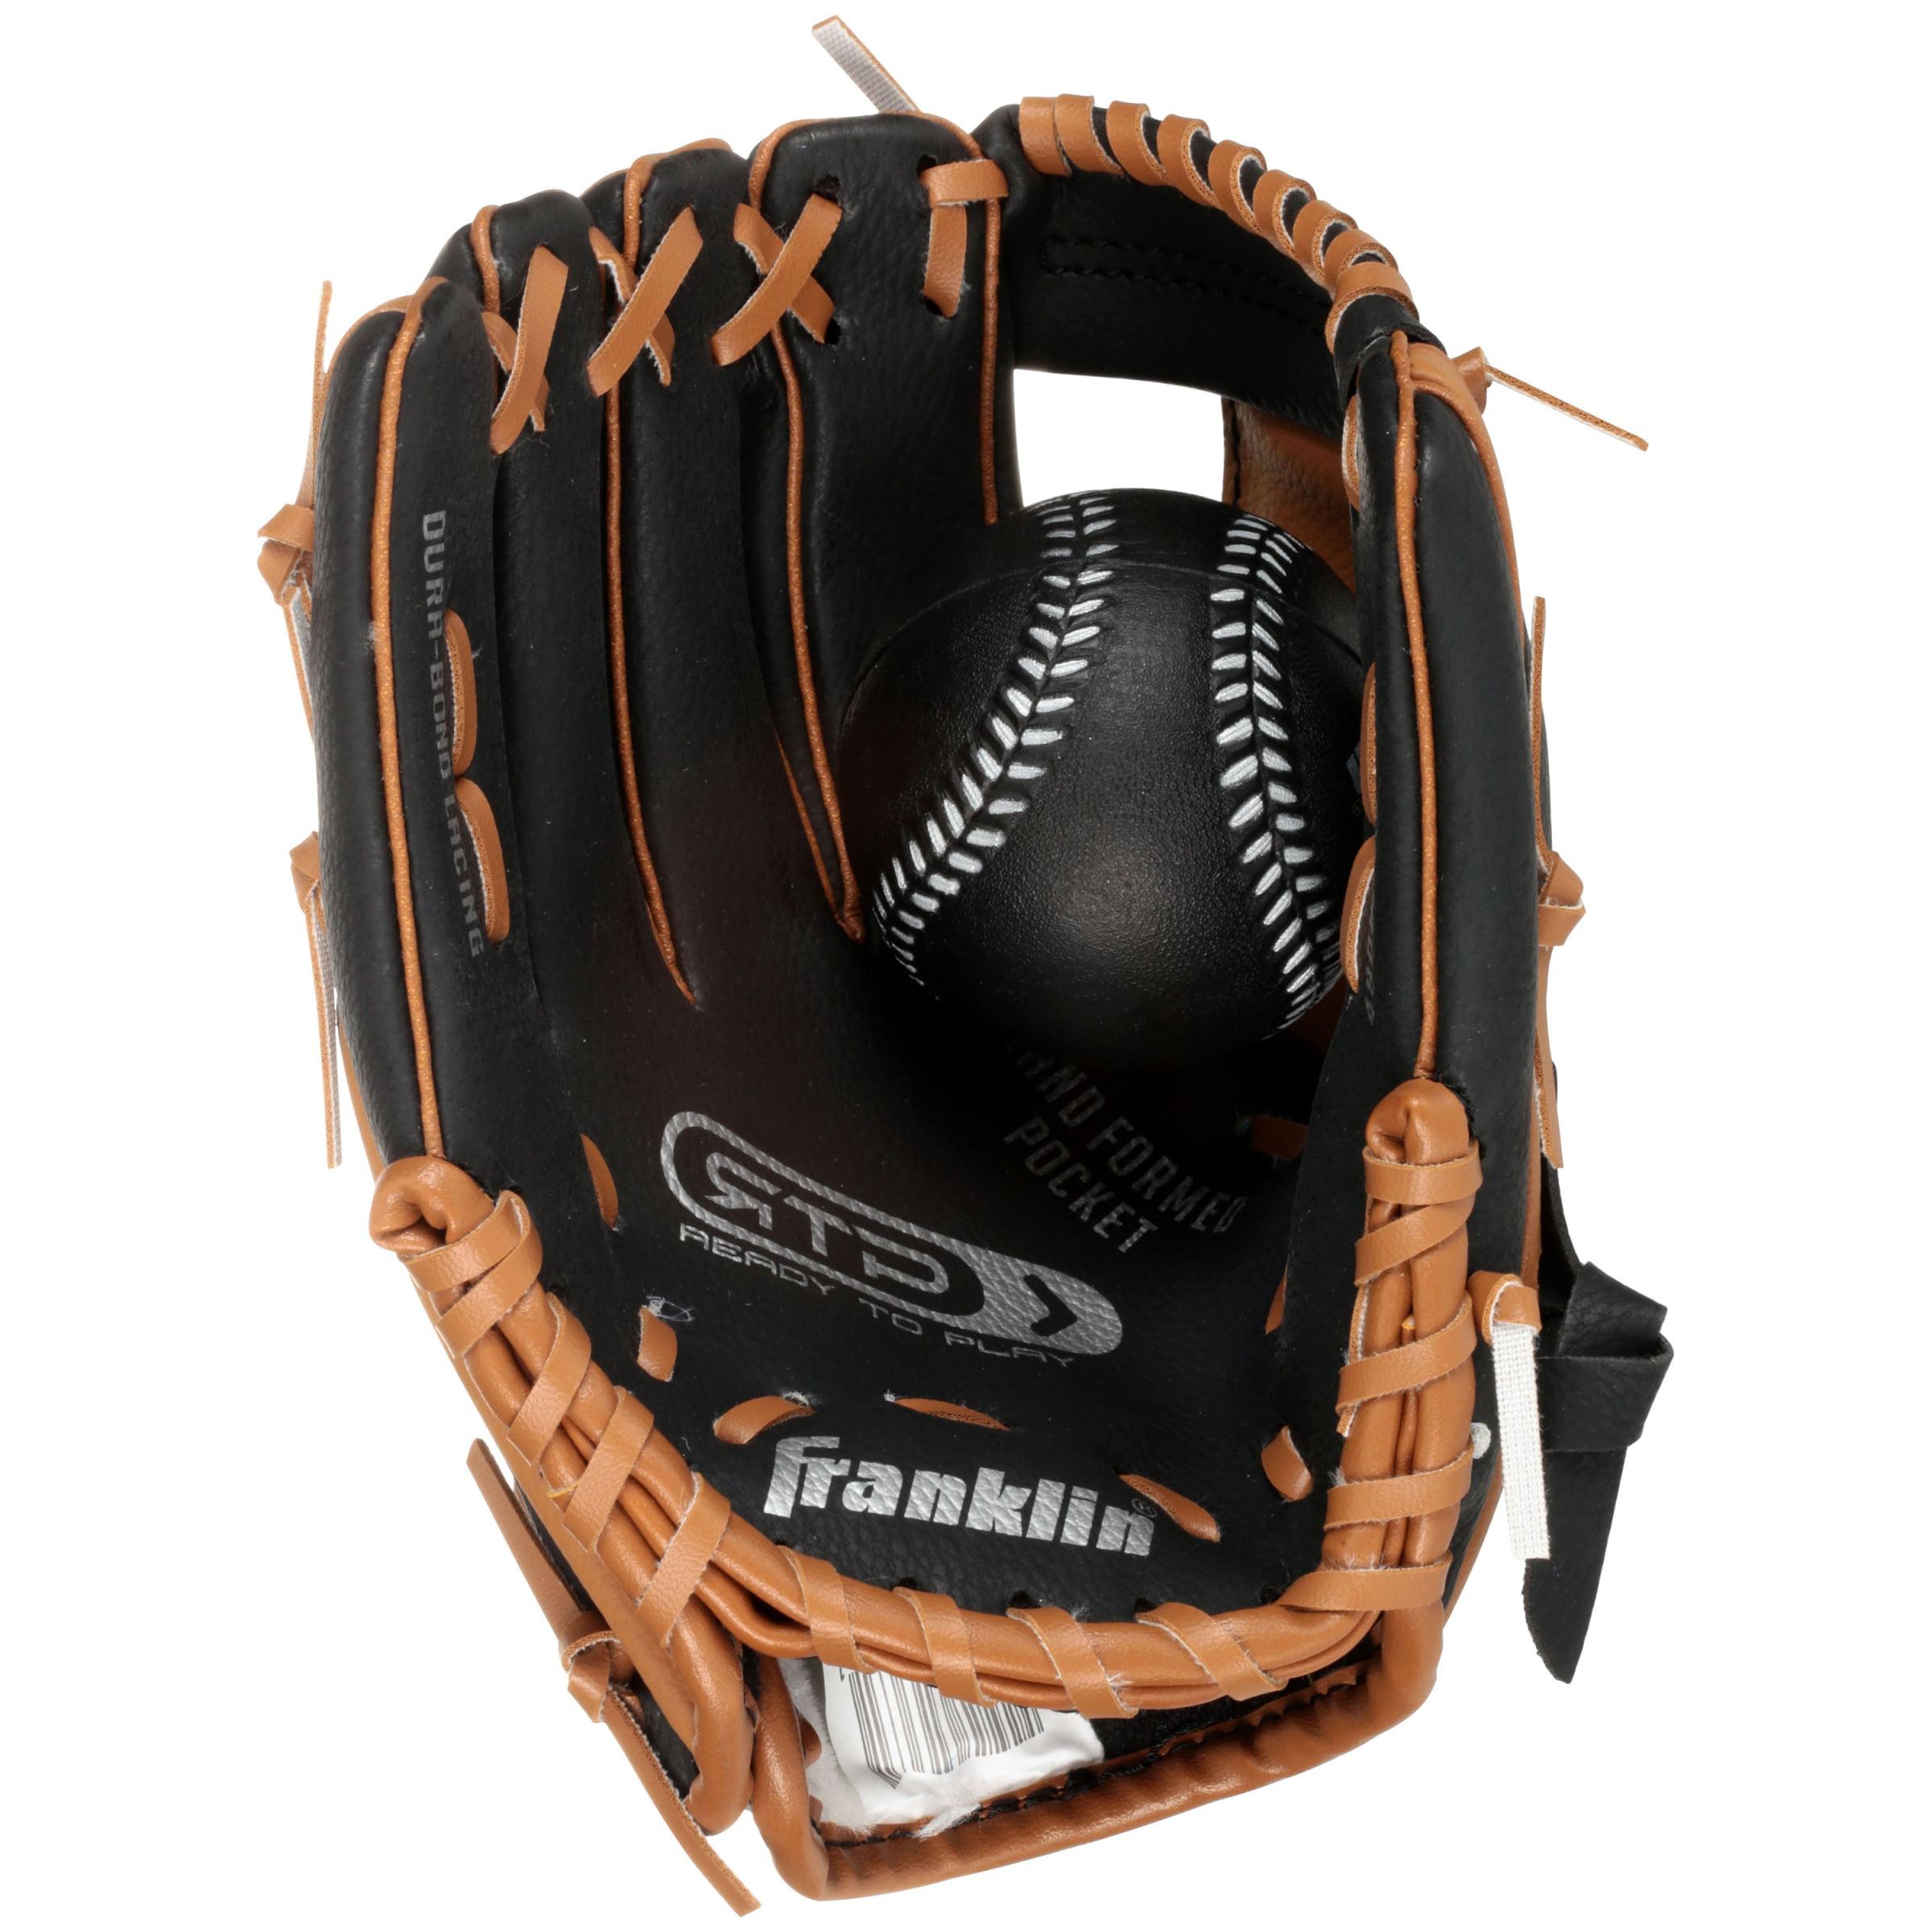 "Franklin® 9.5"" Teeball Fielding Glove"